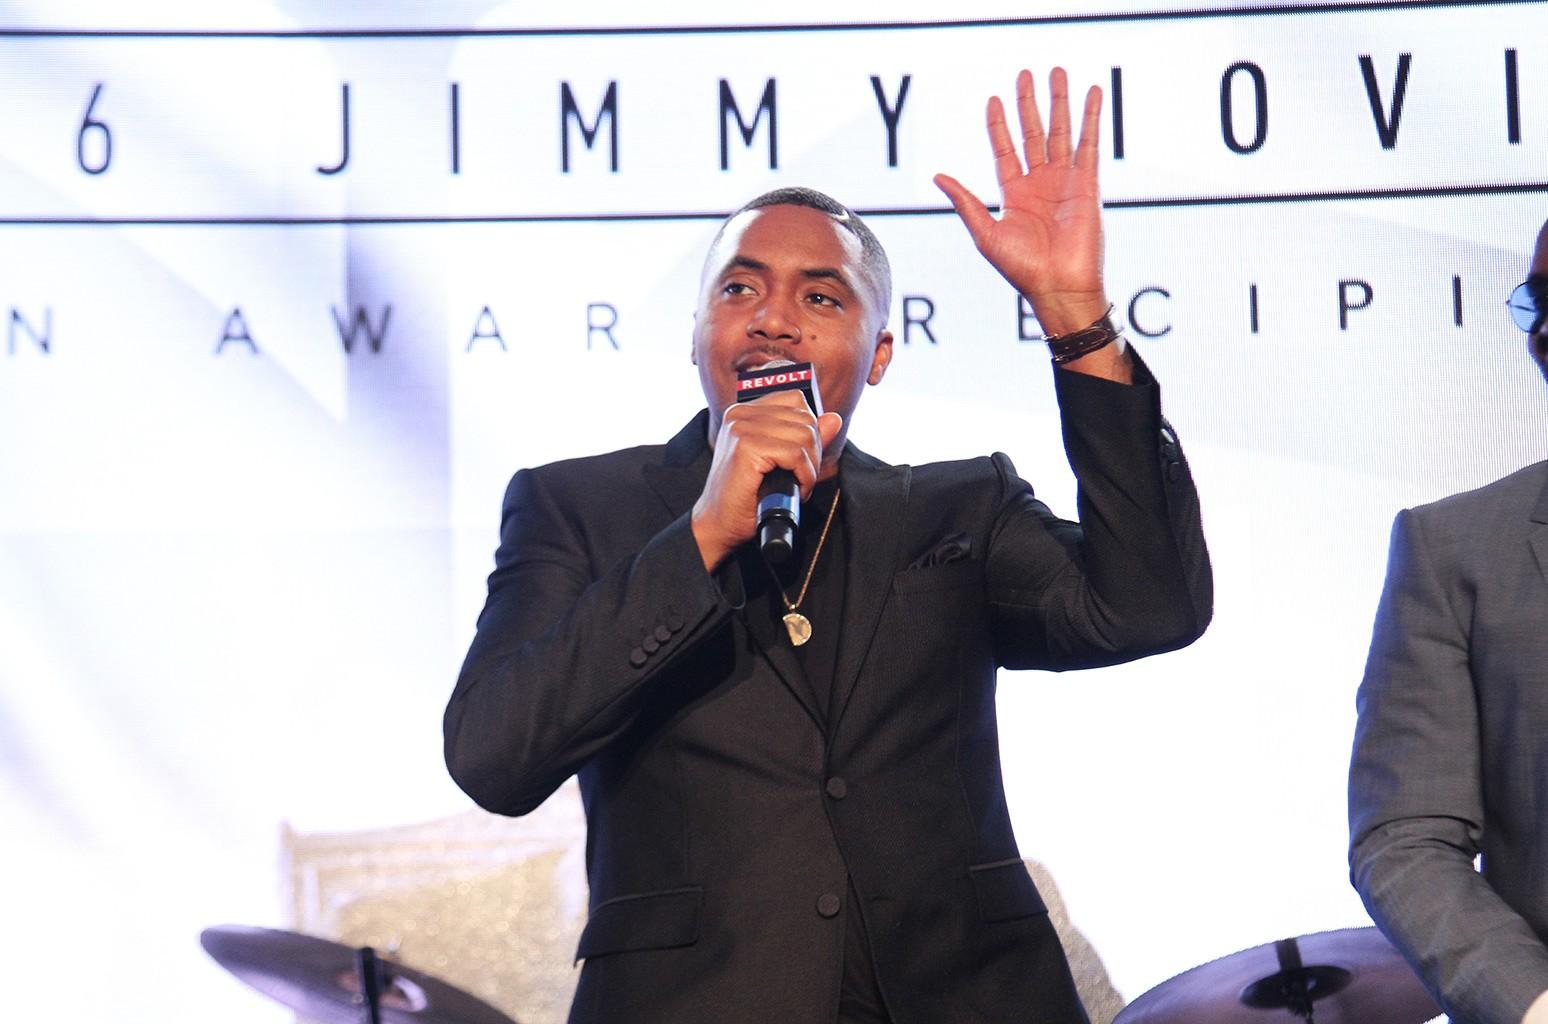 Nas accepts the Jimmy Iovine Award